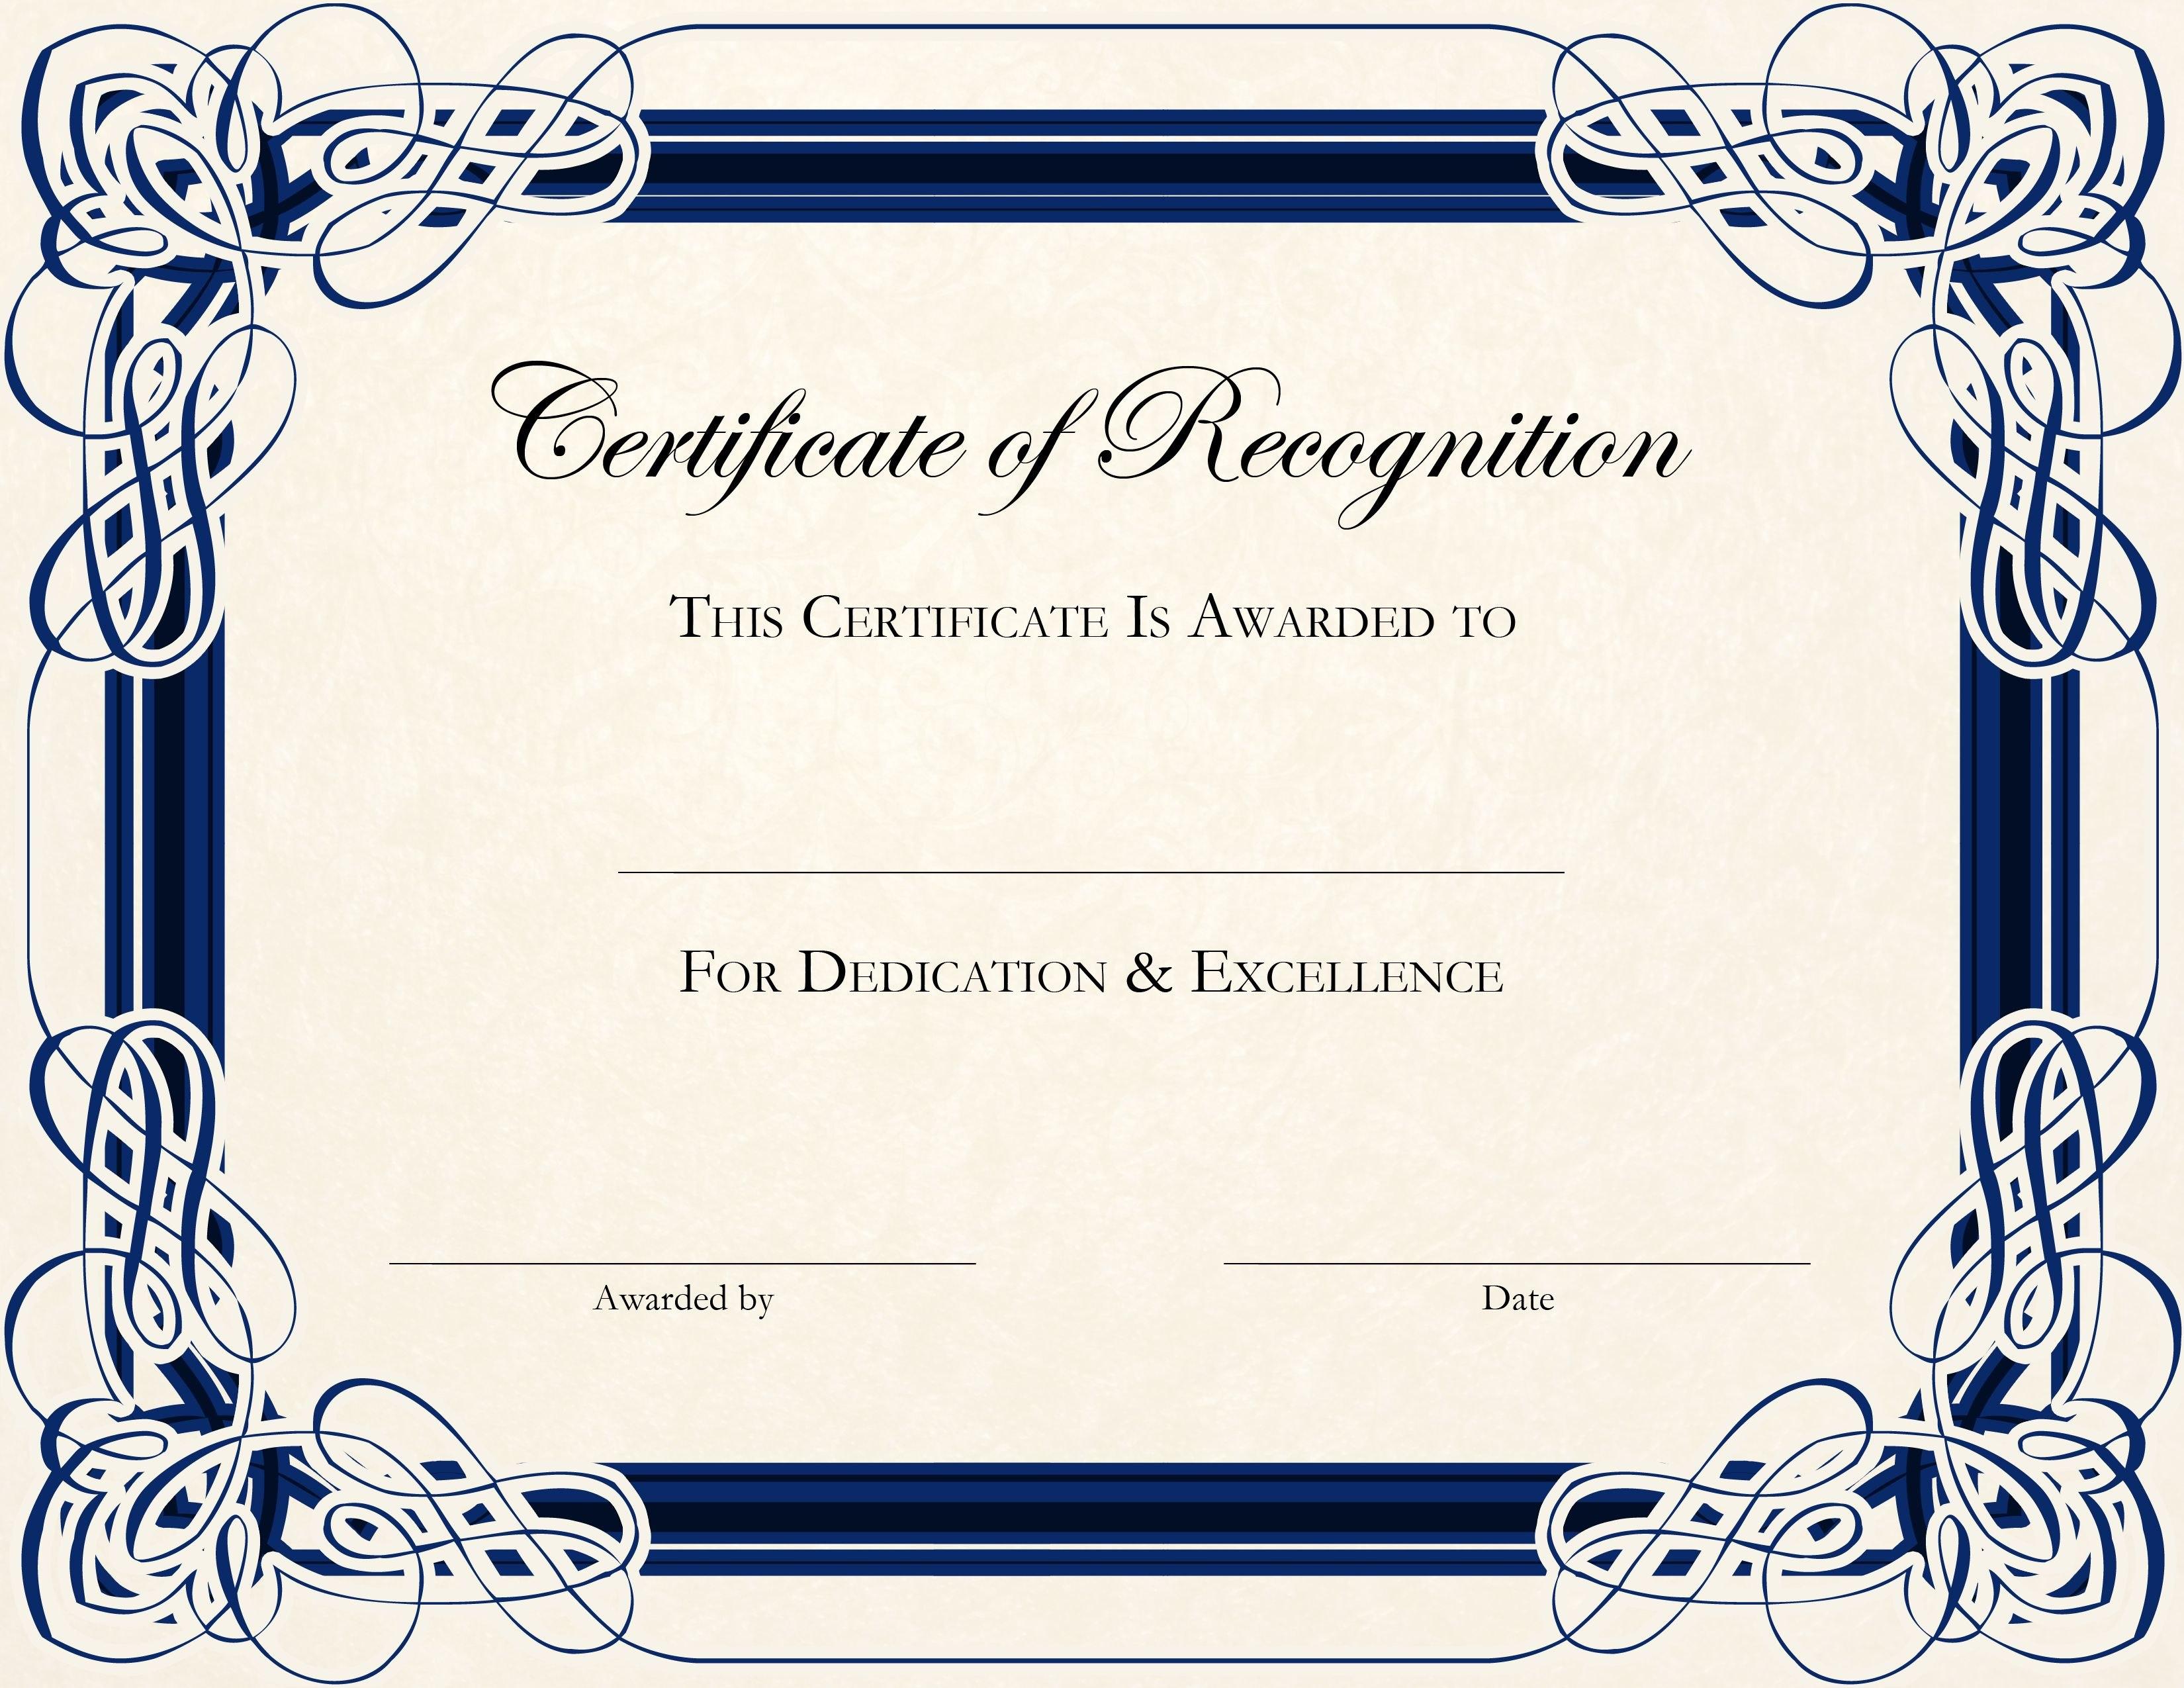 Certificatetemplatedesignsrecognitiondocs  Blankets In Sample Certificate Of Recognition Template